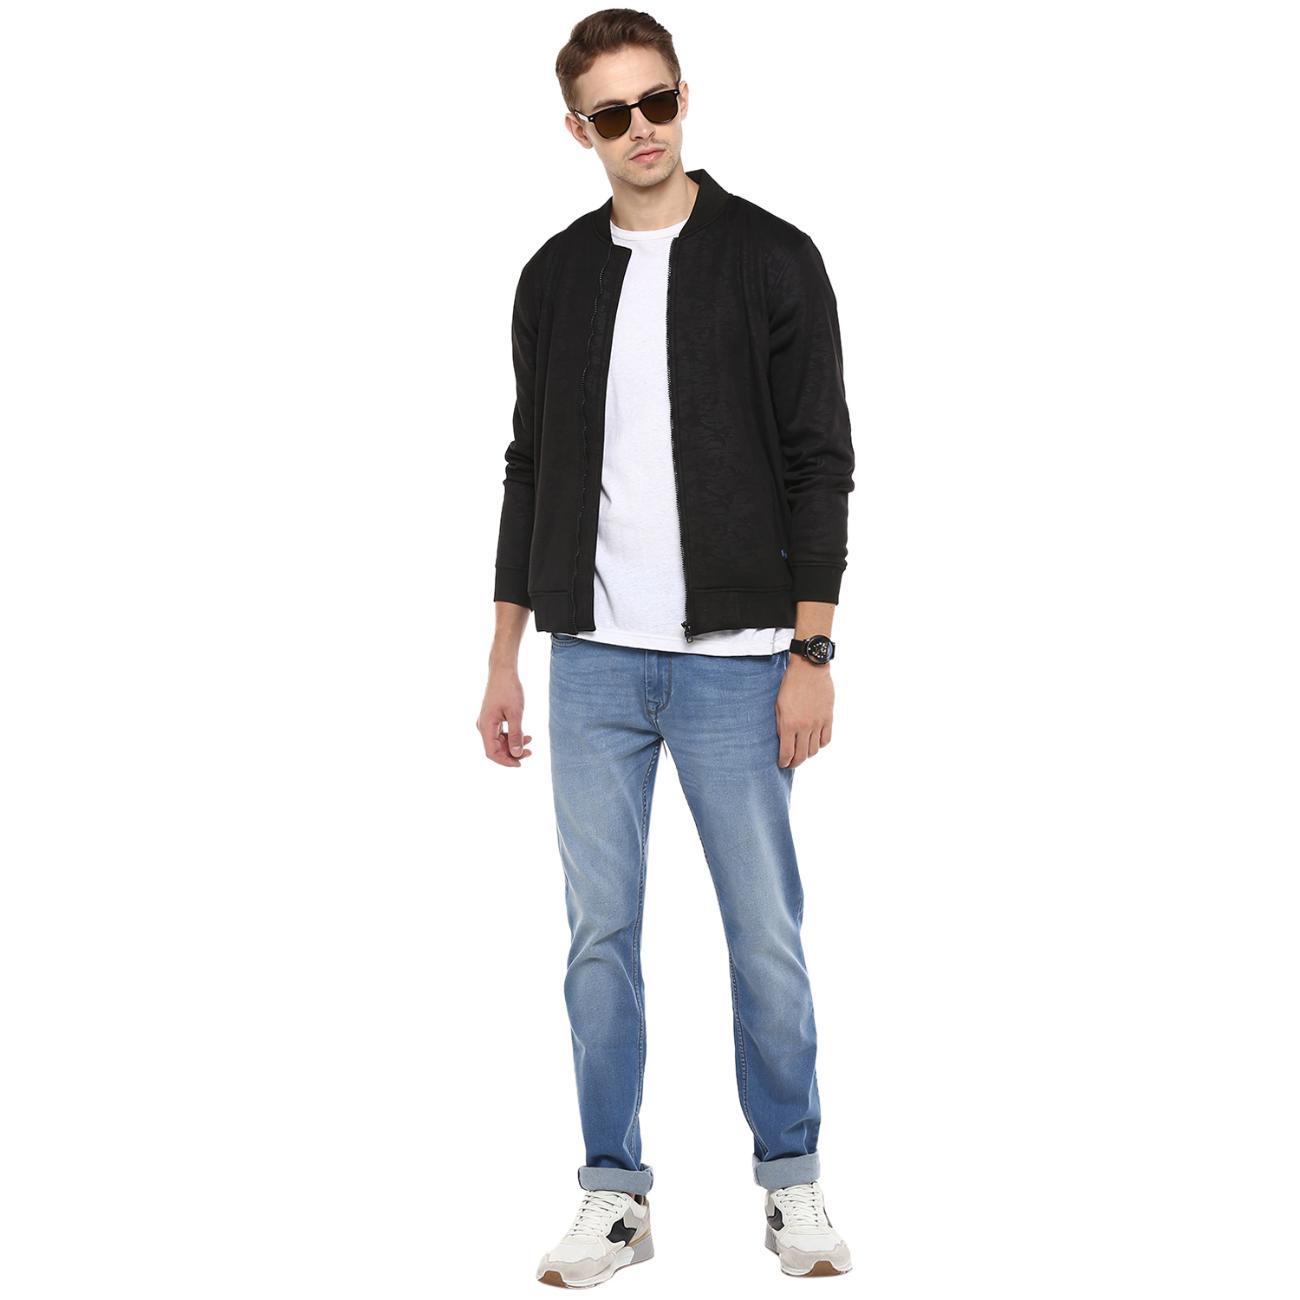 Shop Front Zipper Men's Bomber Jacket